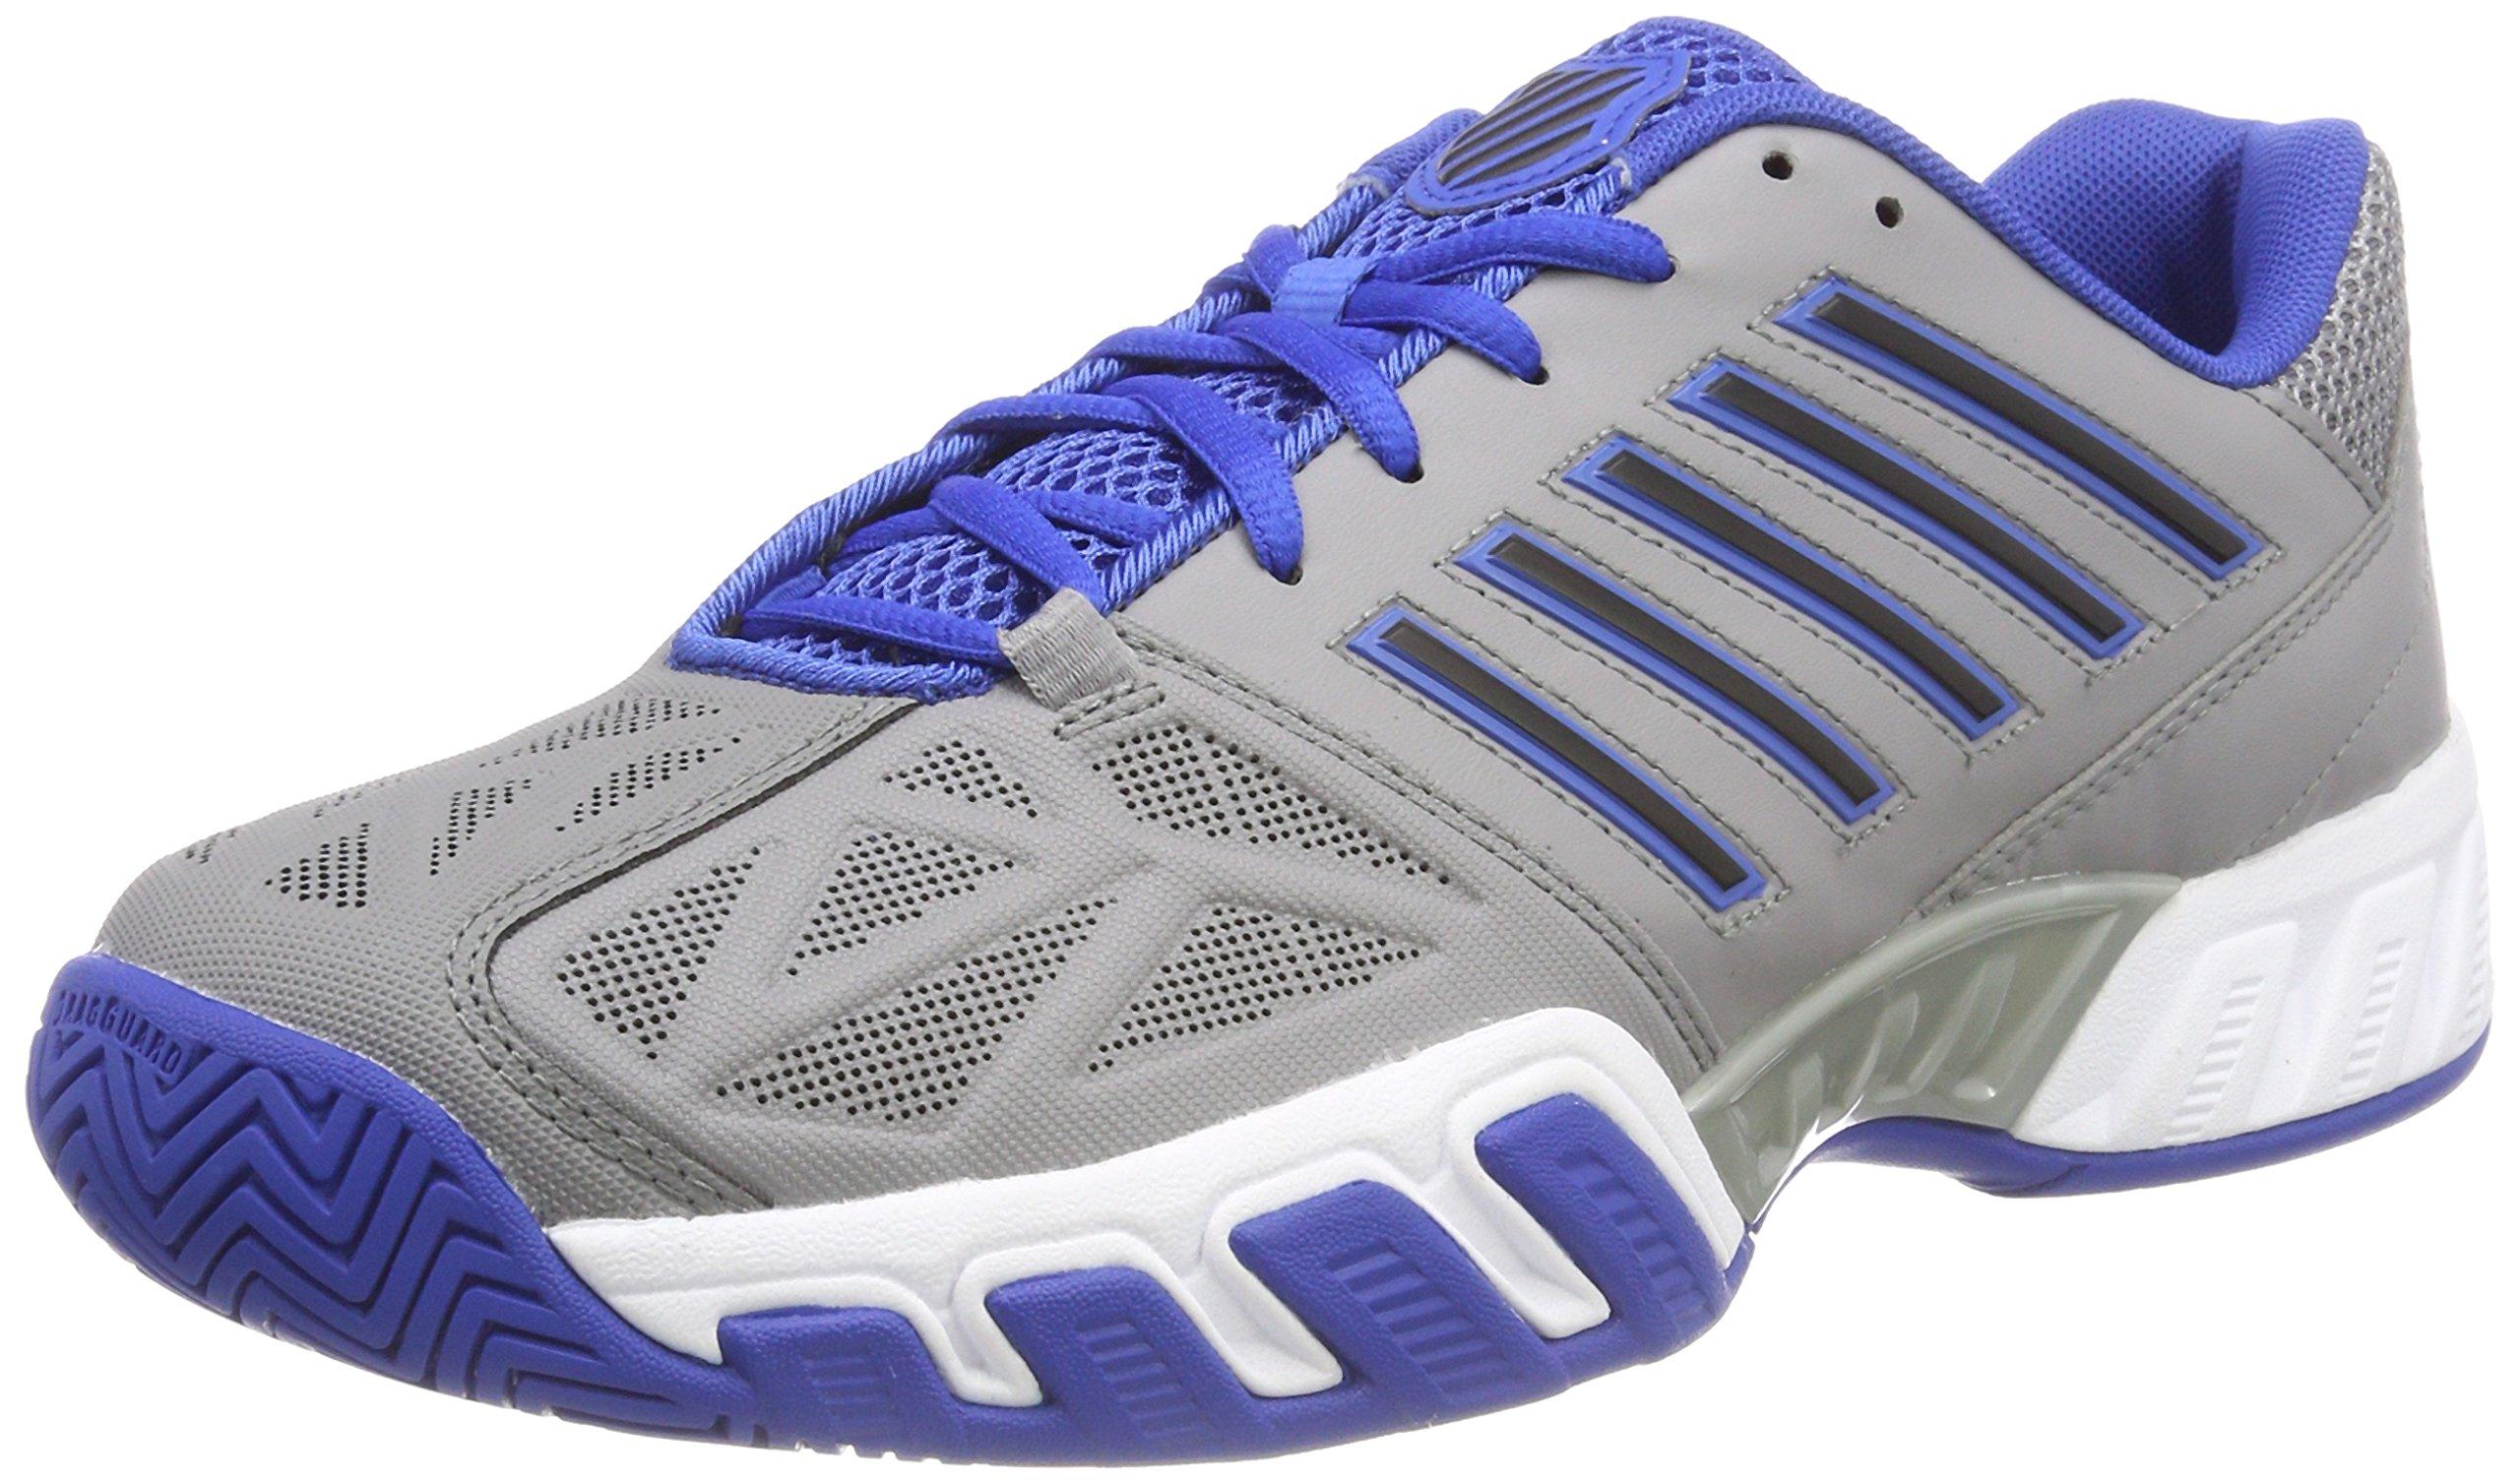 K-Swiss Bigshot Light 3 Tennis Shoe - Grey/Blue - Mens - 10